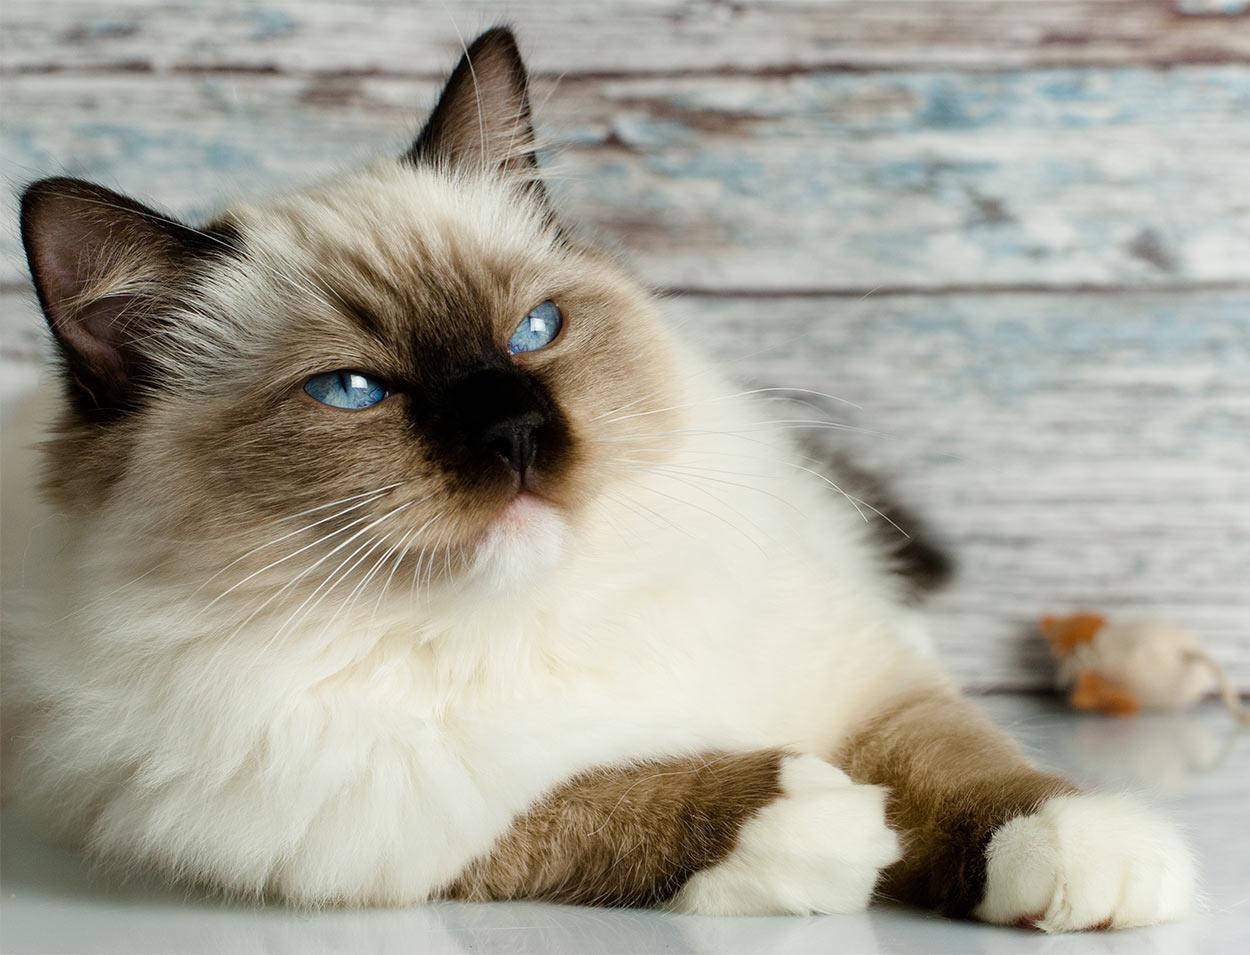 dog-like cat breeds - ragdoll